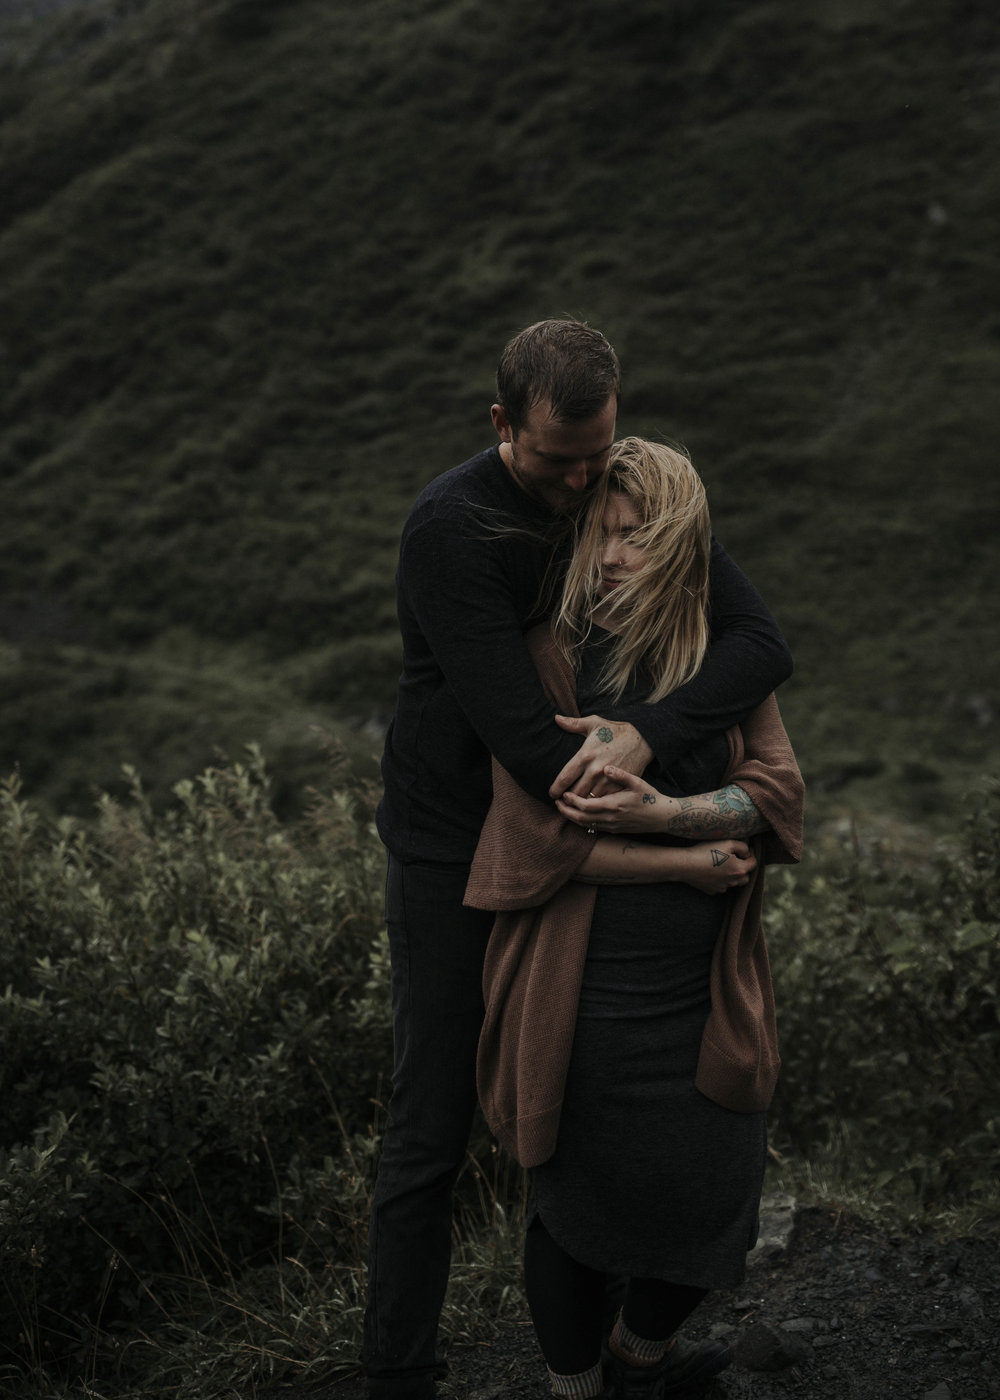 ariel-lynn-alaskan-mountain-couples-session-3.jpg